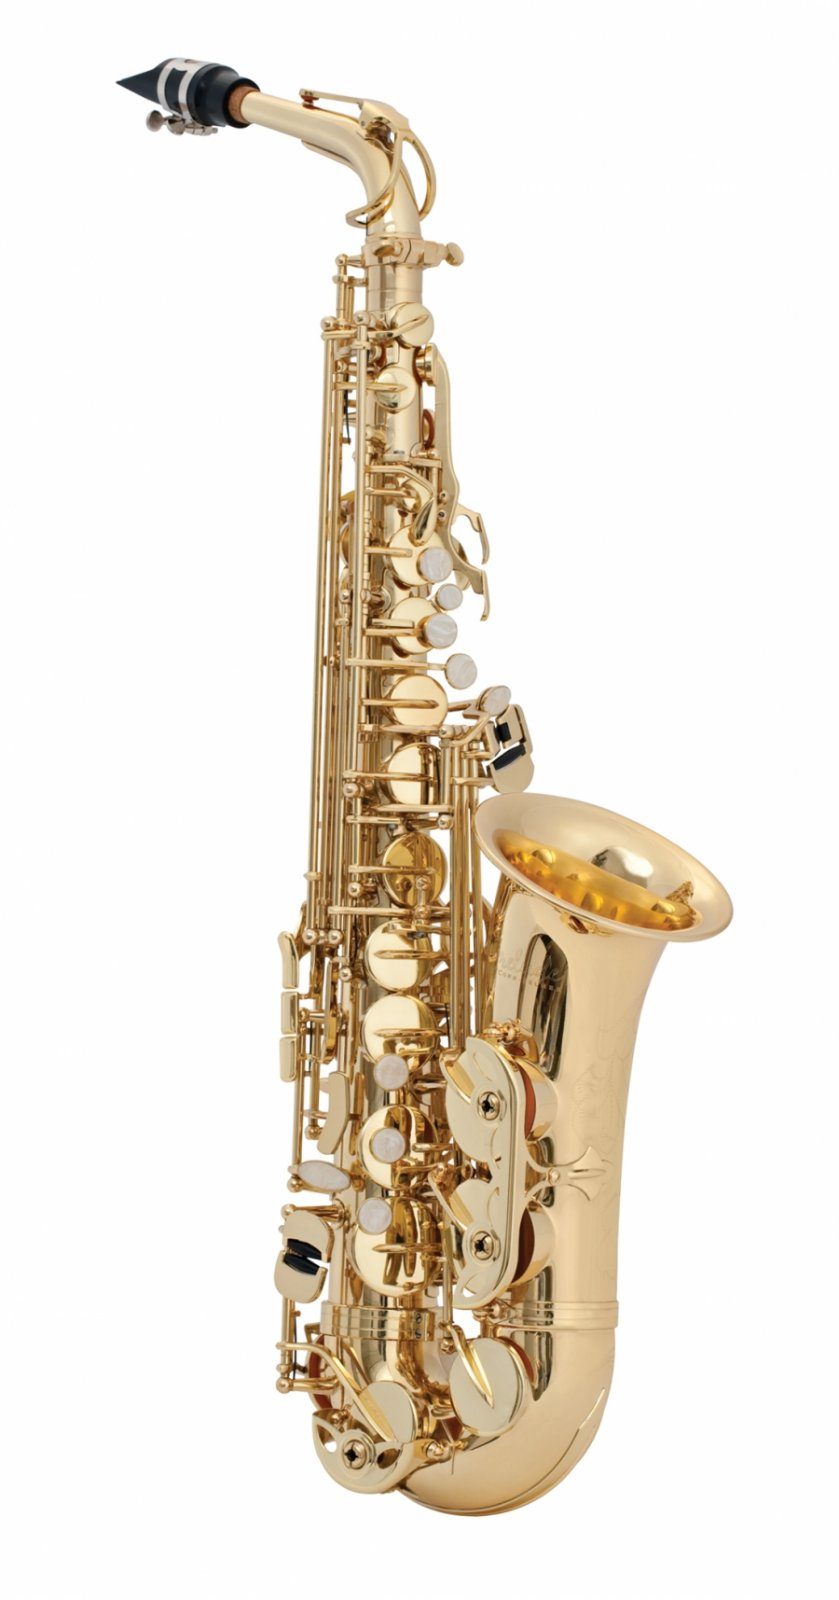 Conn-Selmer Prelude AS711 Alto Sax Outfit